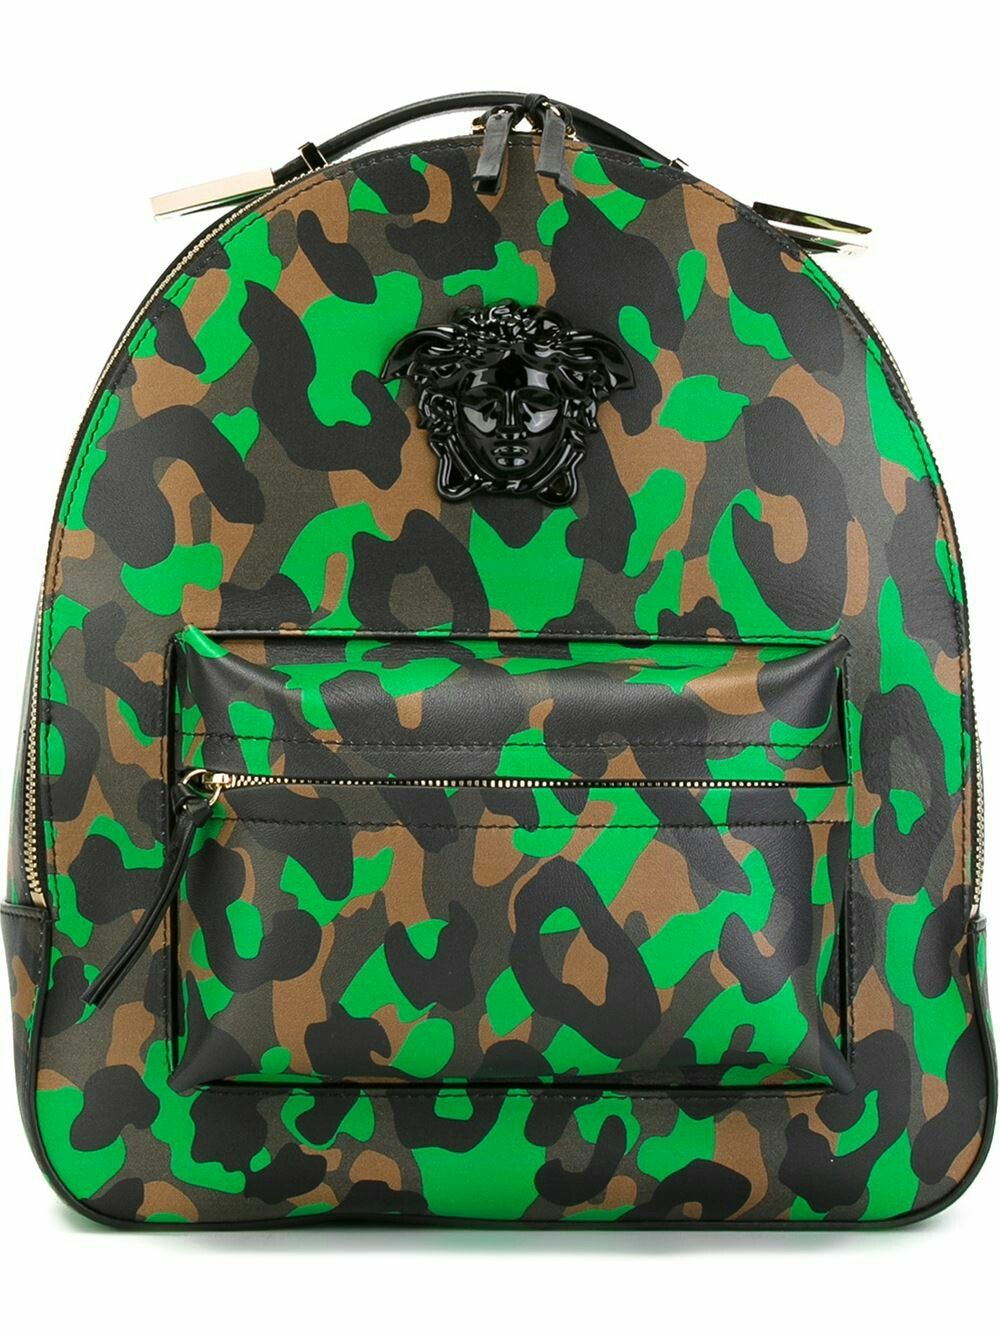 2ef51ee0bfb2 Camo Bag, Camo Backpack, Backpack Bags, Versace Bag, Herschel Heritage  Backpack,